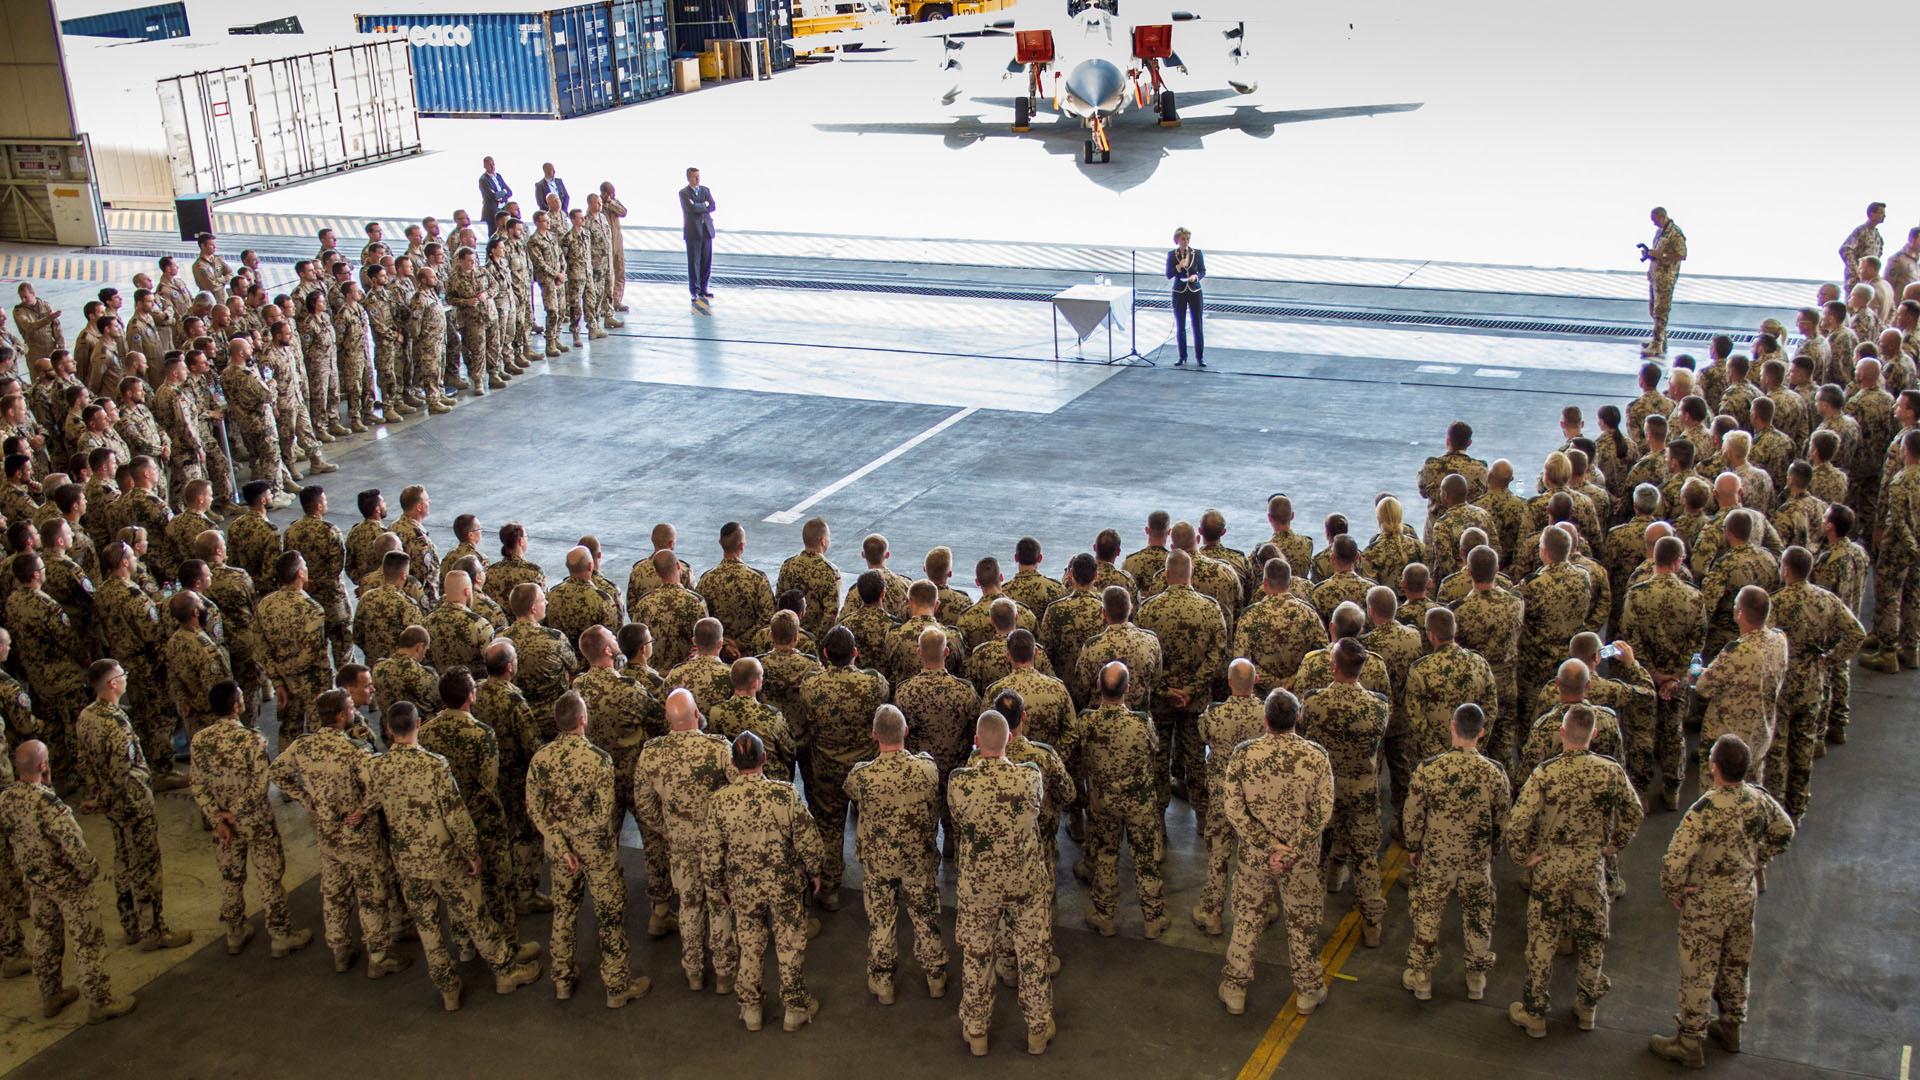 Alemania continua en la lucha antiterrorista